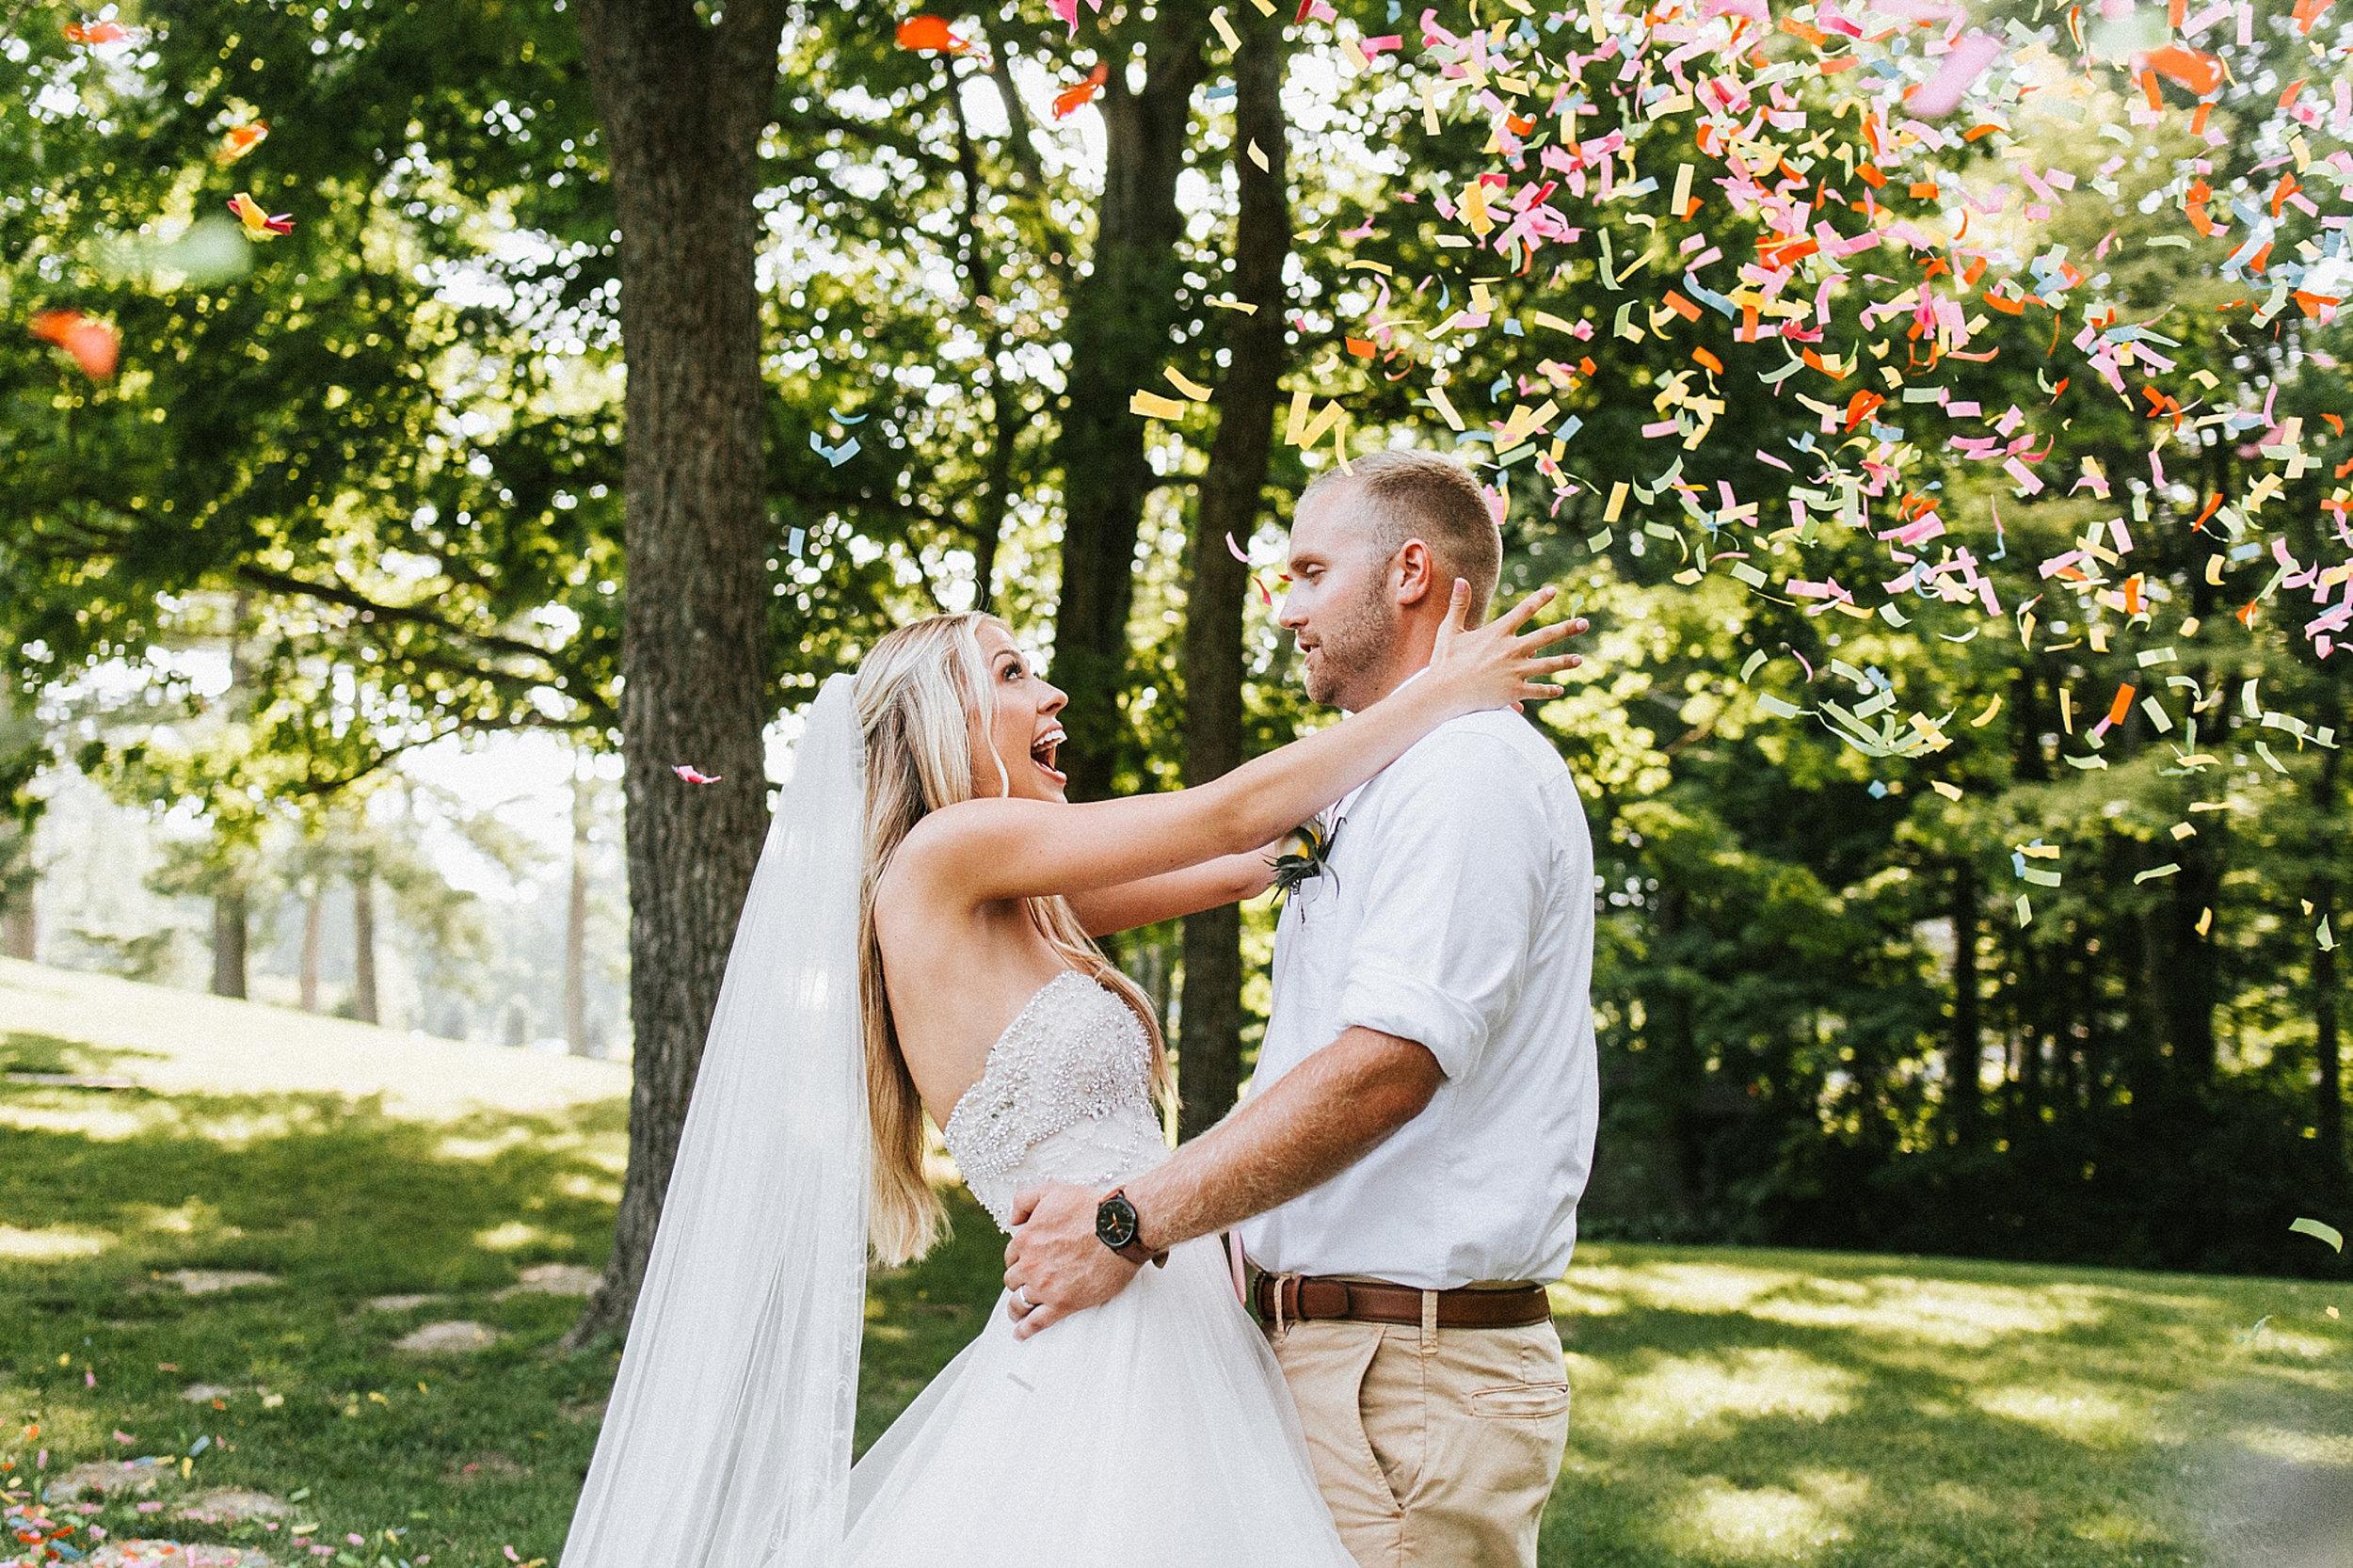 Brooke Townsend Photography - Cincinnati Wedding Photographer (95 of 153).jpg